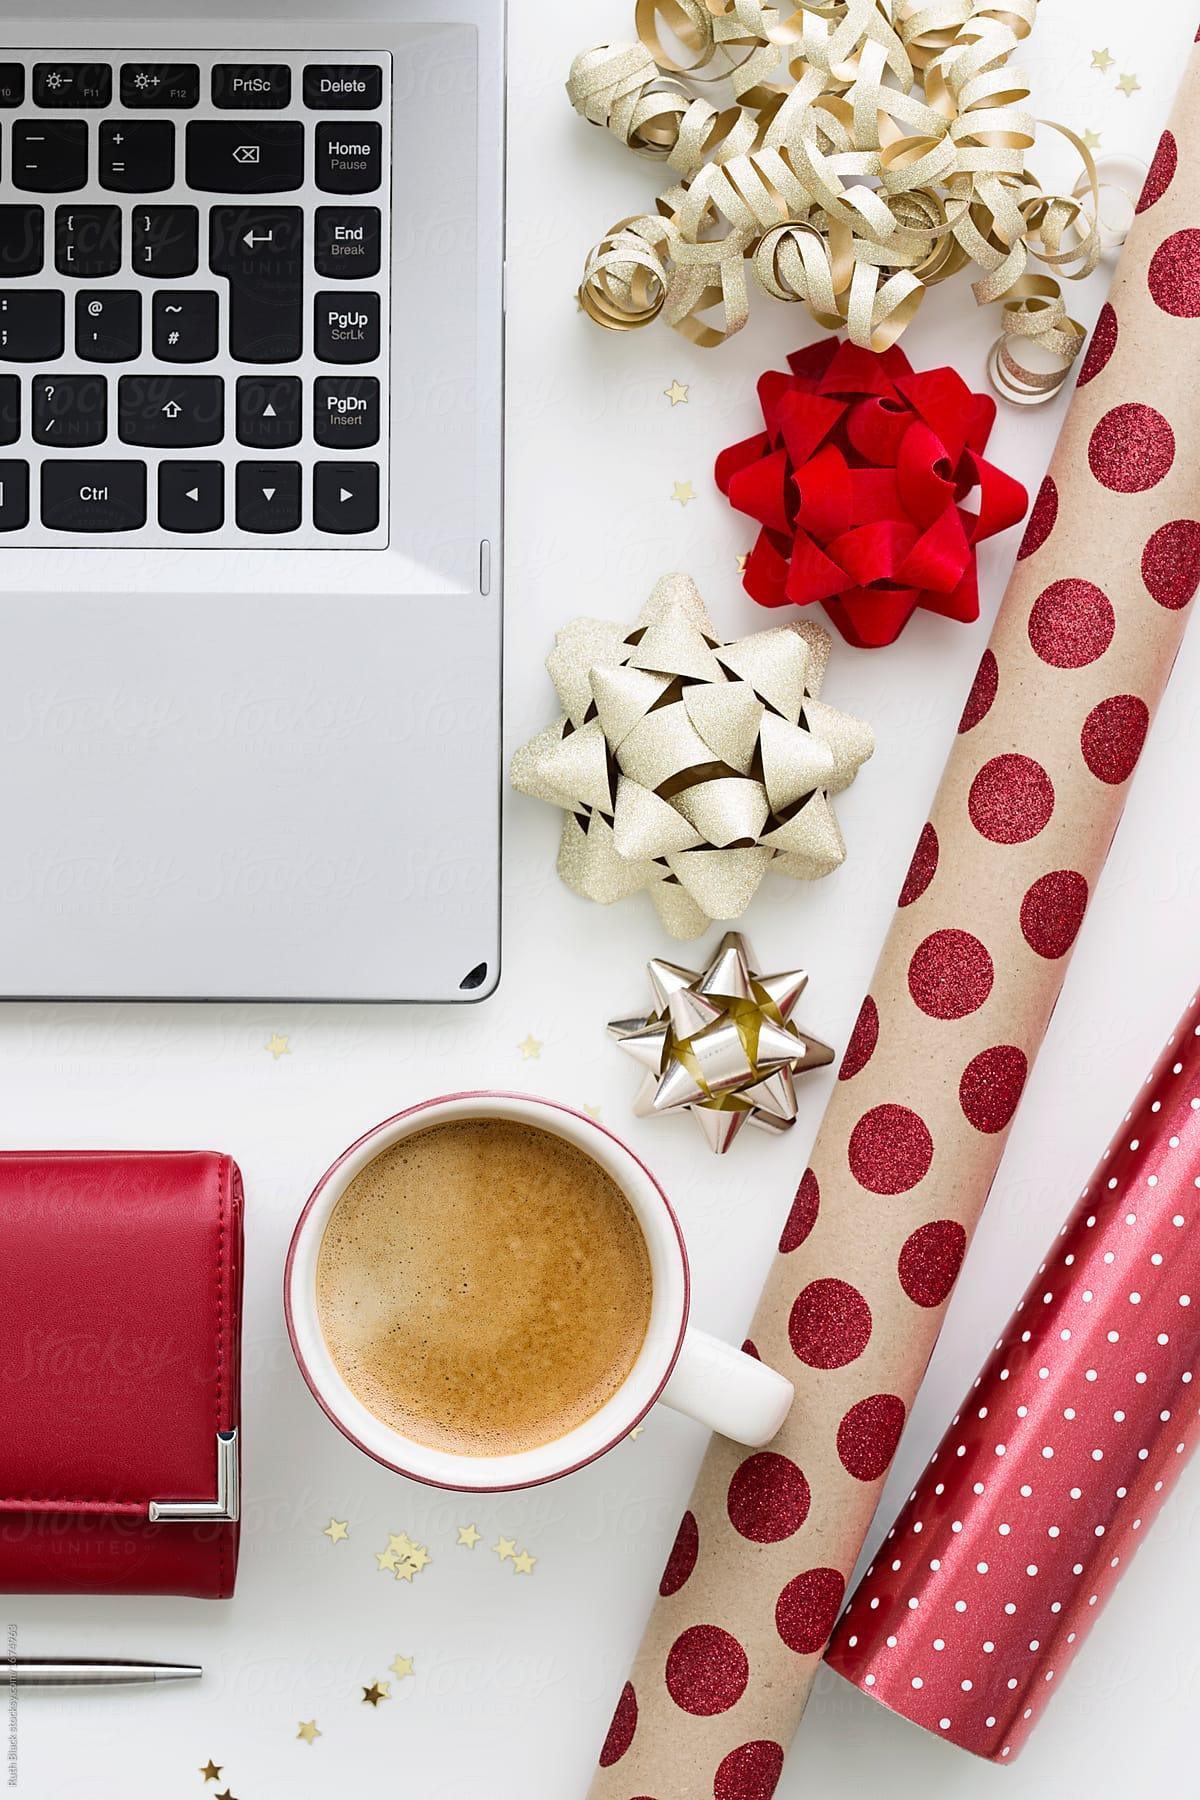 Online Christmas shopping